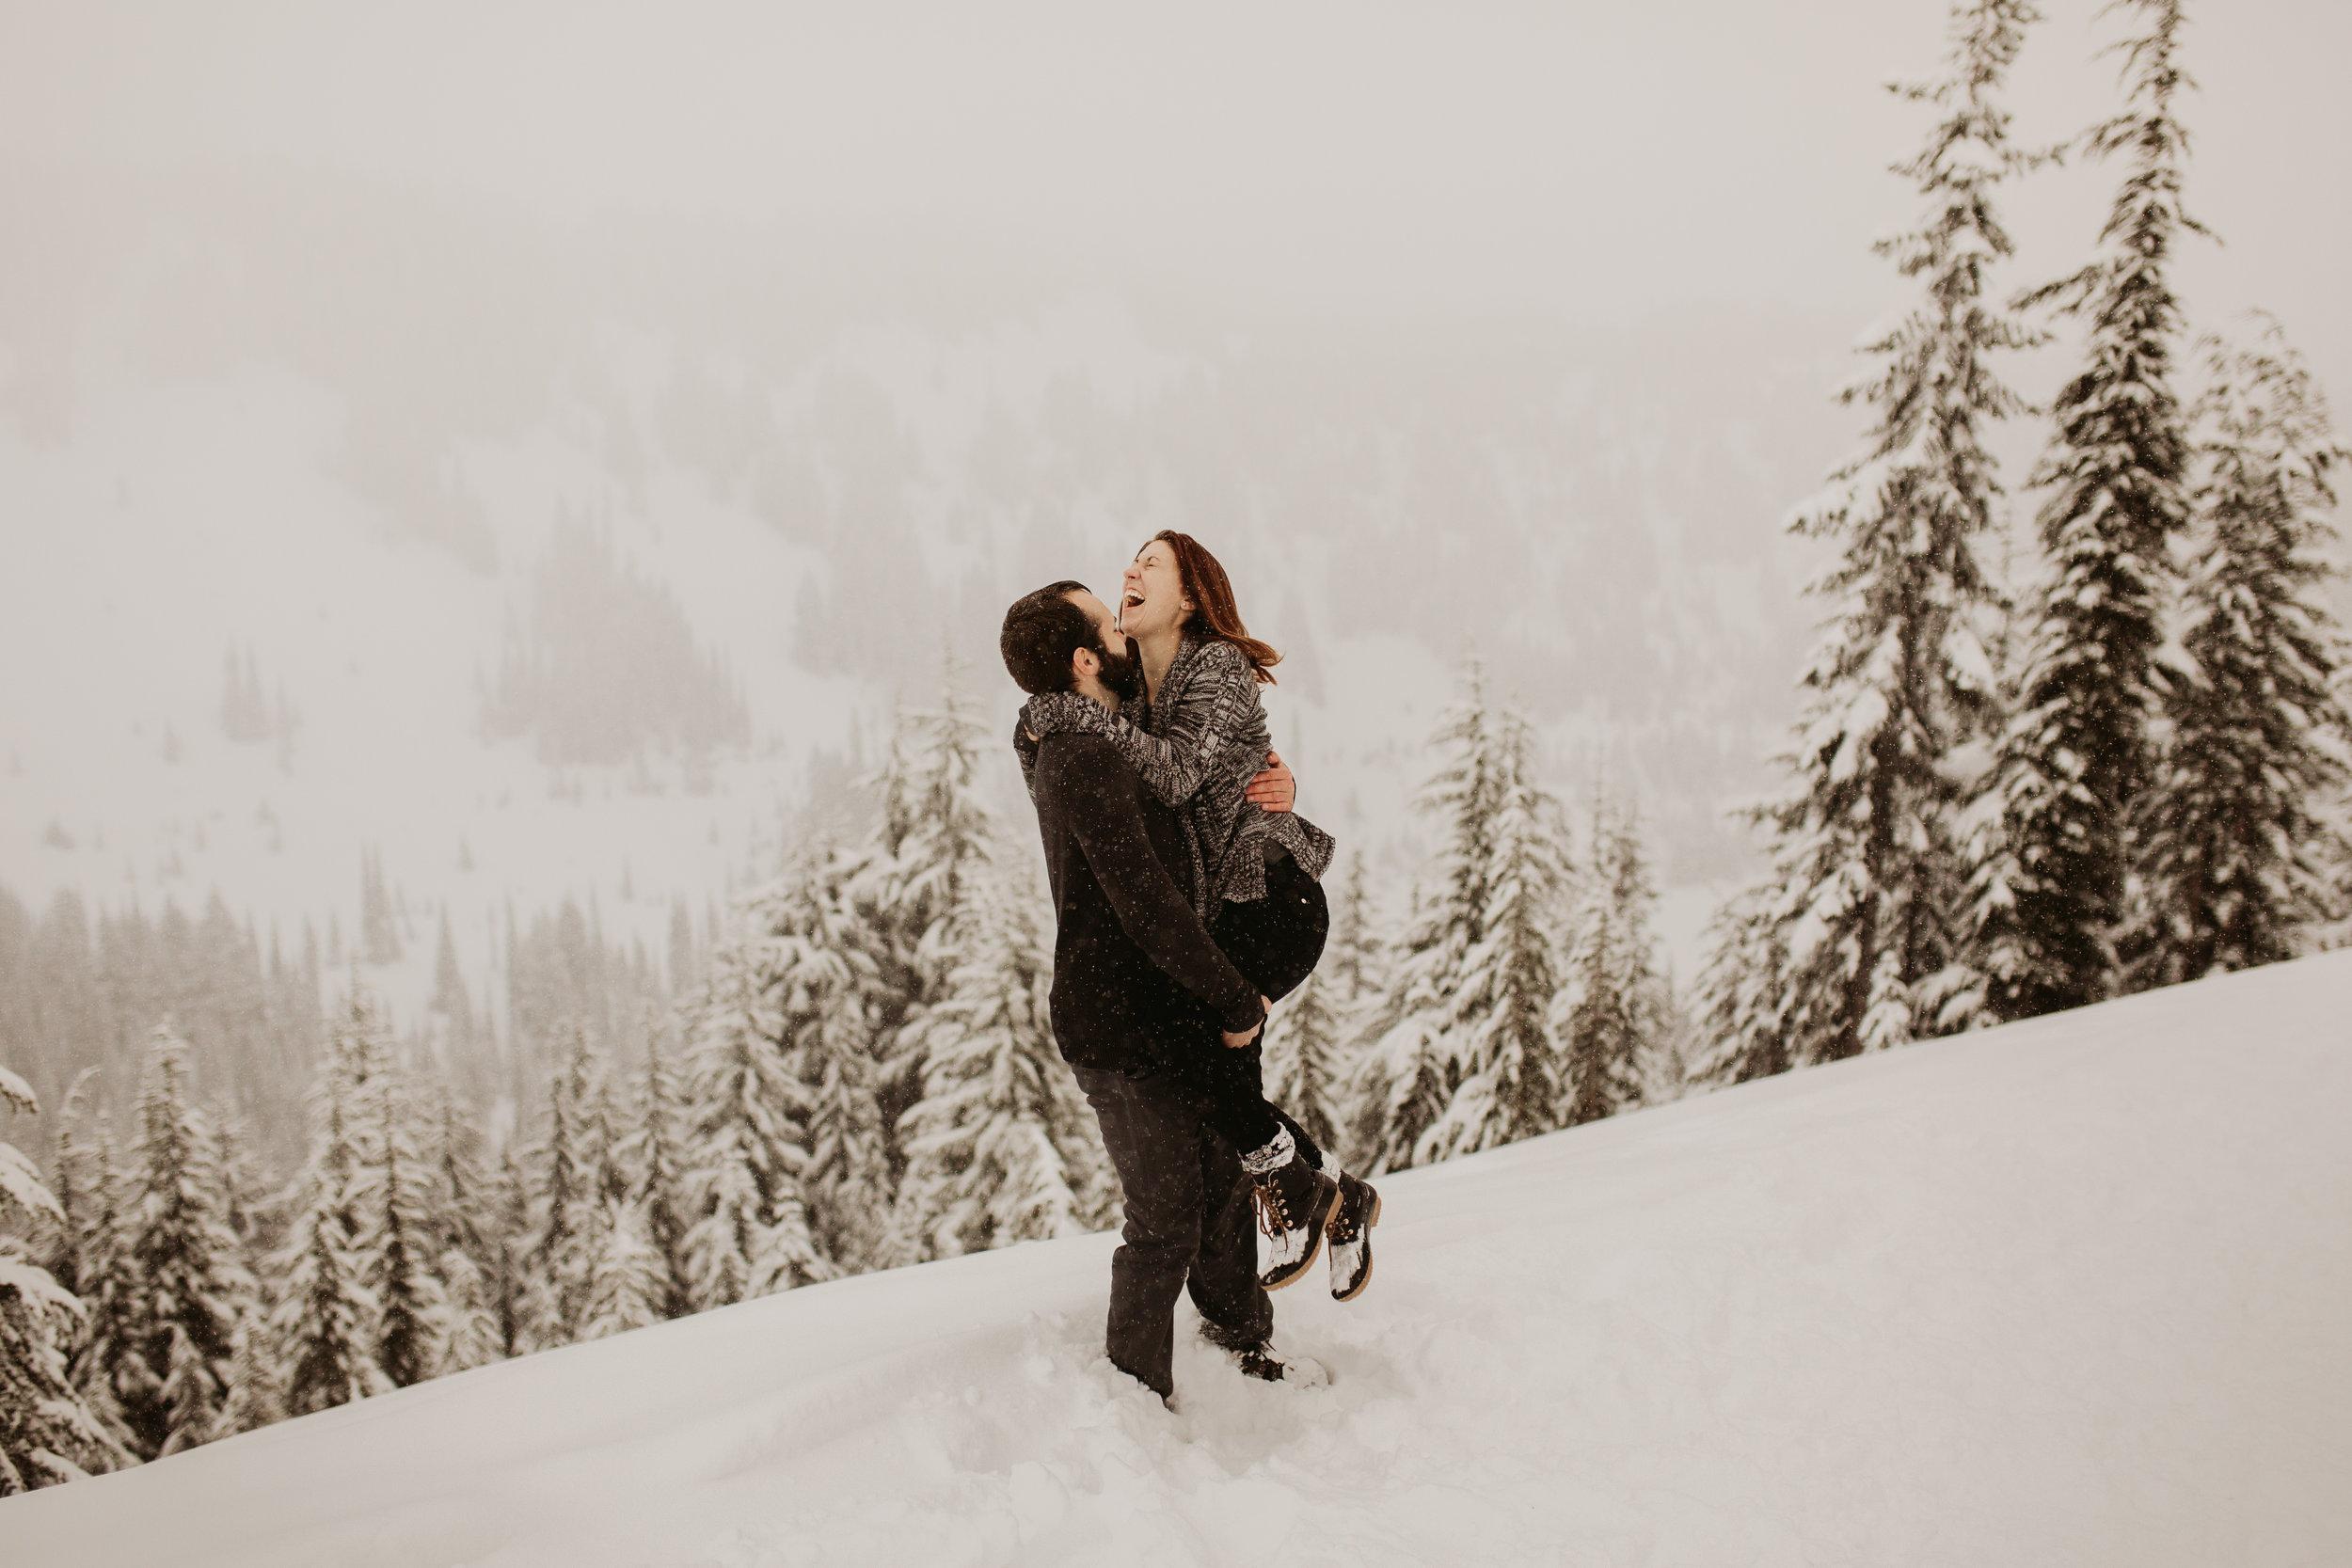 pnw_washington_oregon_elopement_mount_rainer_engagement_wedding_photographer18.jpg